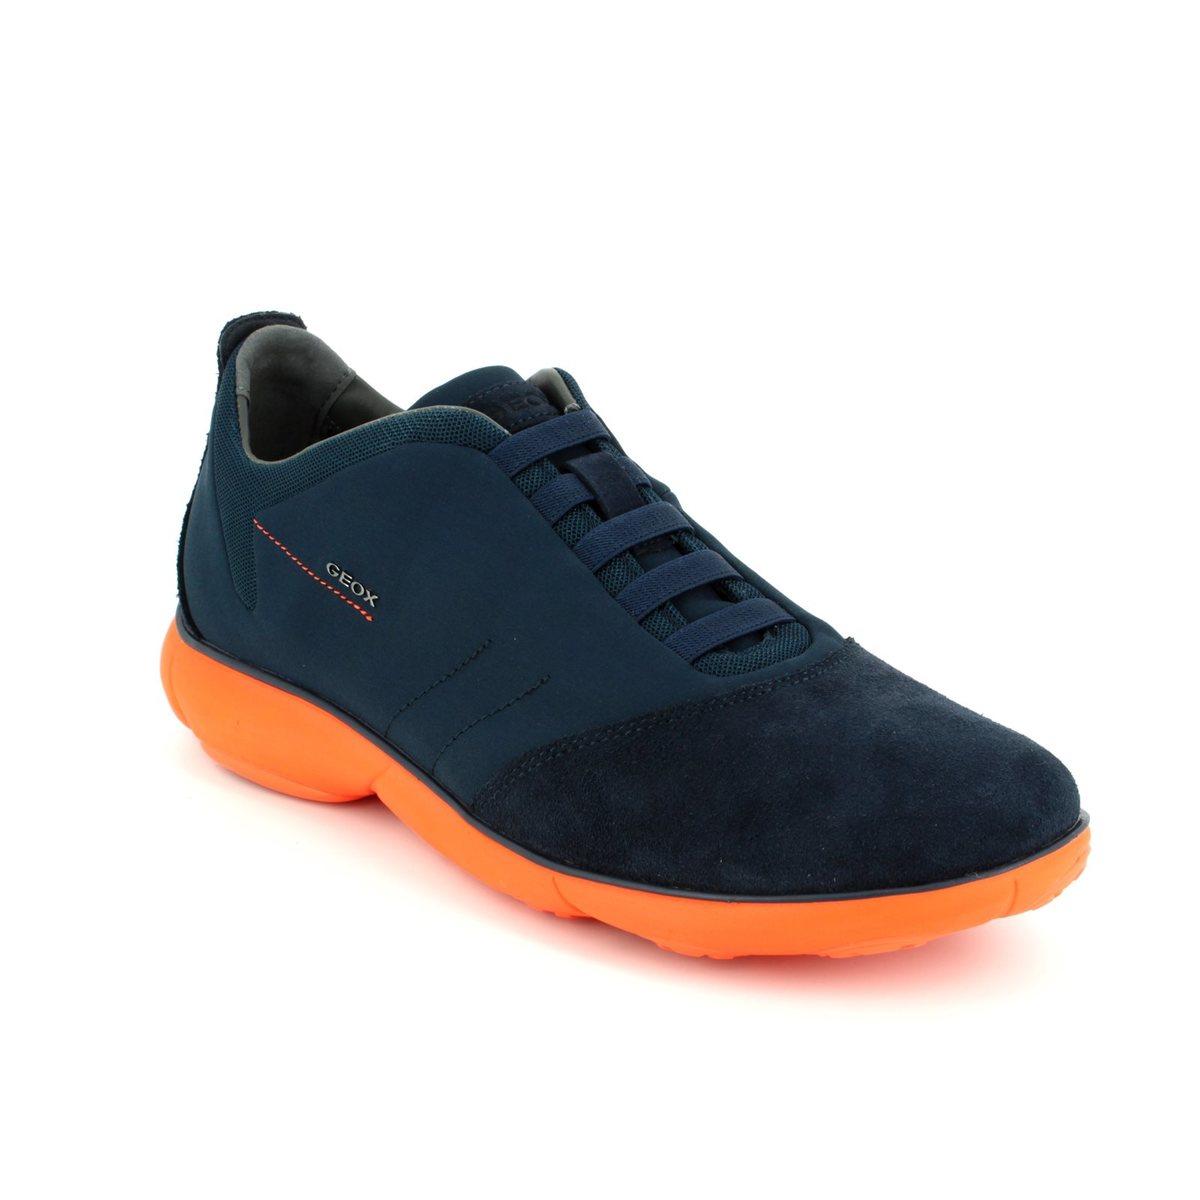 Geox Casual Shoes - Navy Orange - U62D7F/C0820 NEBULA F